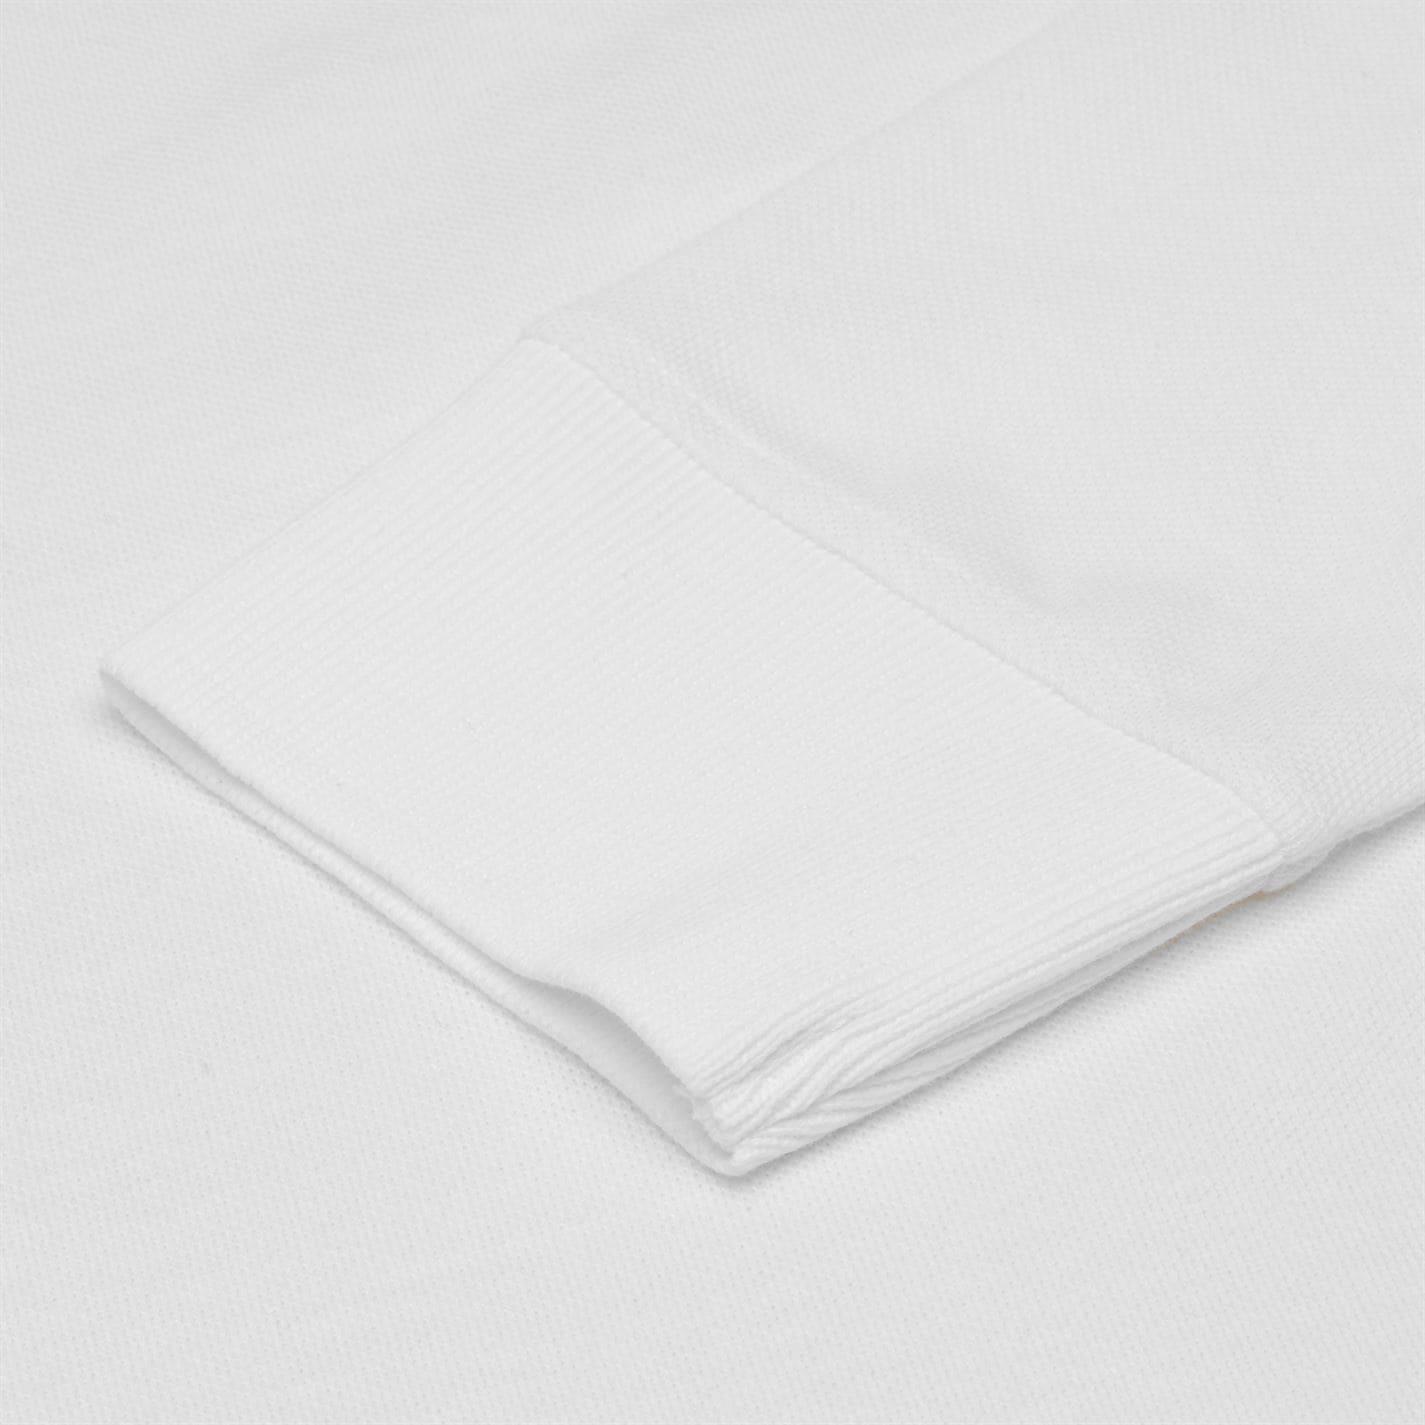 NEW-Pierre-Cardin-Mens-Long-Sleeve-Pure-Cotton-Polo-Shirt-Size-S-M-L-XL-XXL thumbnail 32